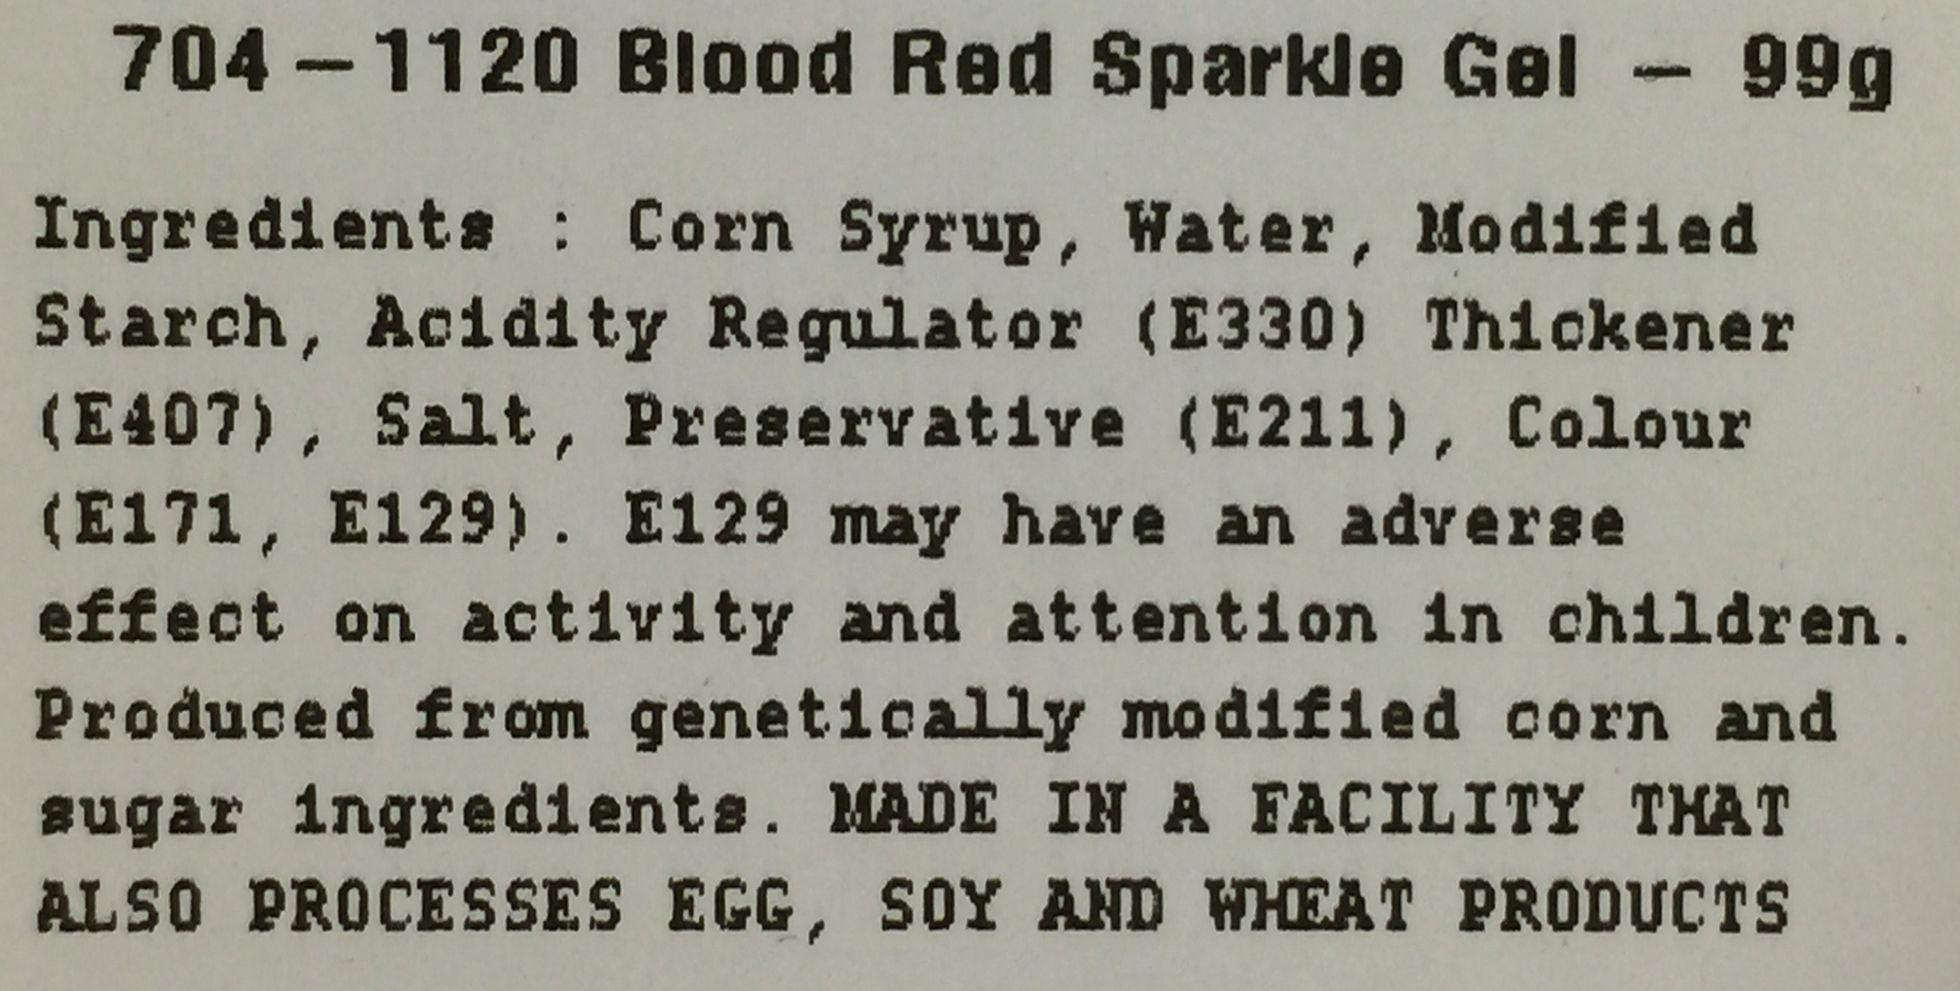 Ingredient information